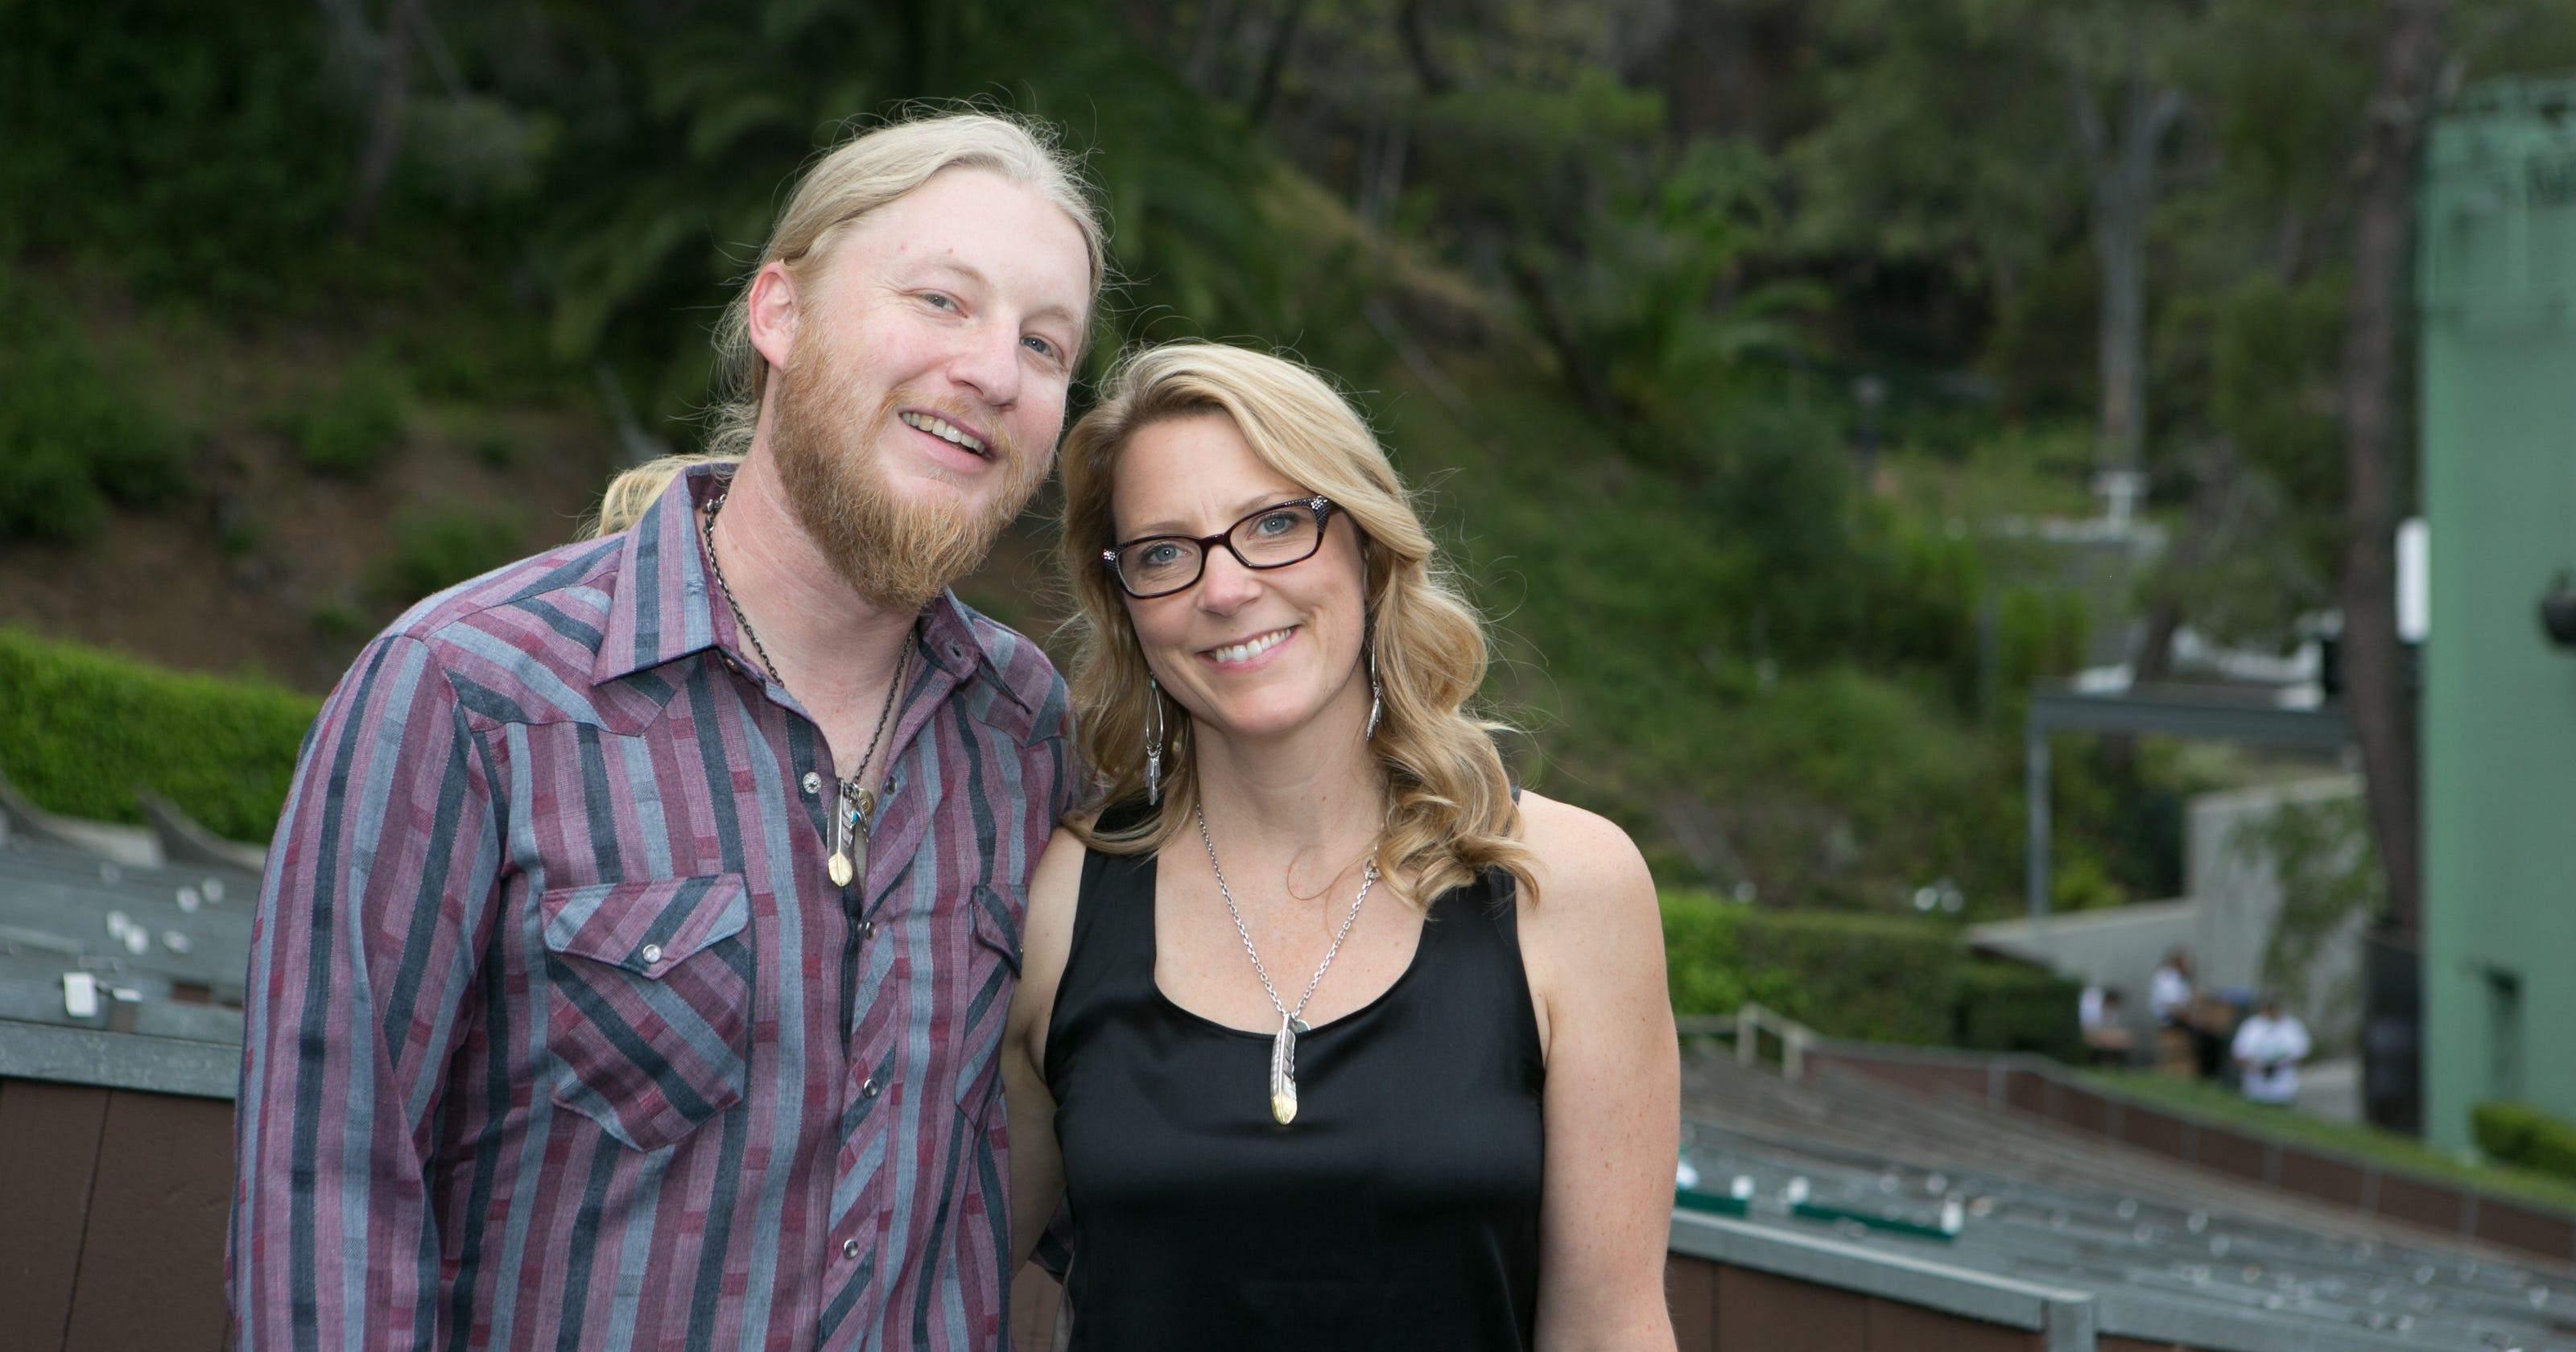 Blues Guitar Heroes Susan Tedeschi And Derek Trucks Use